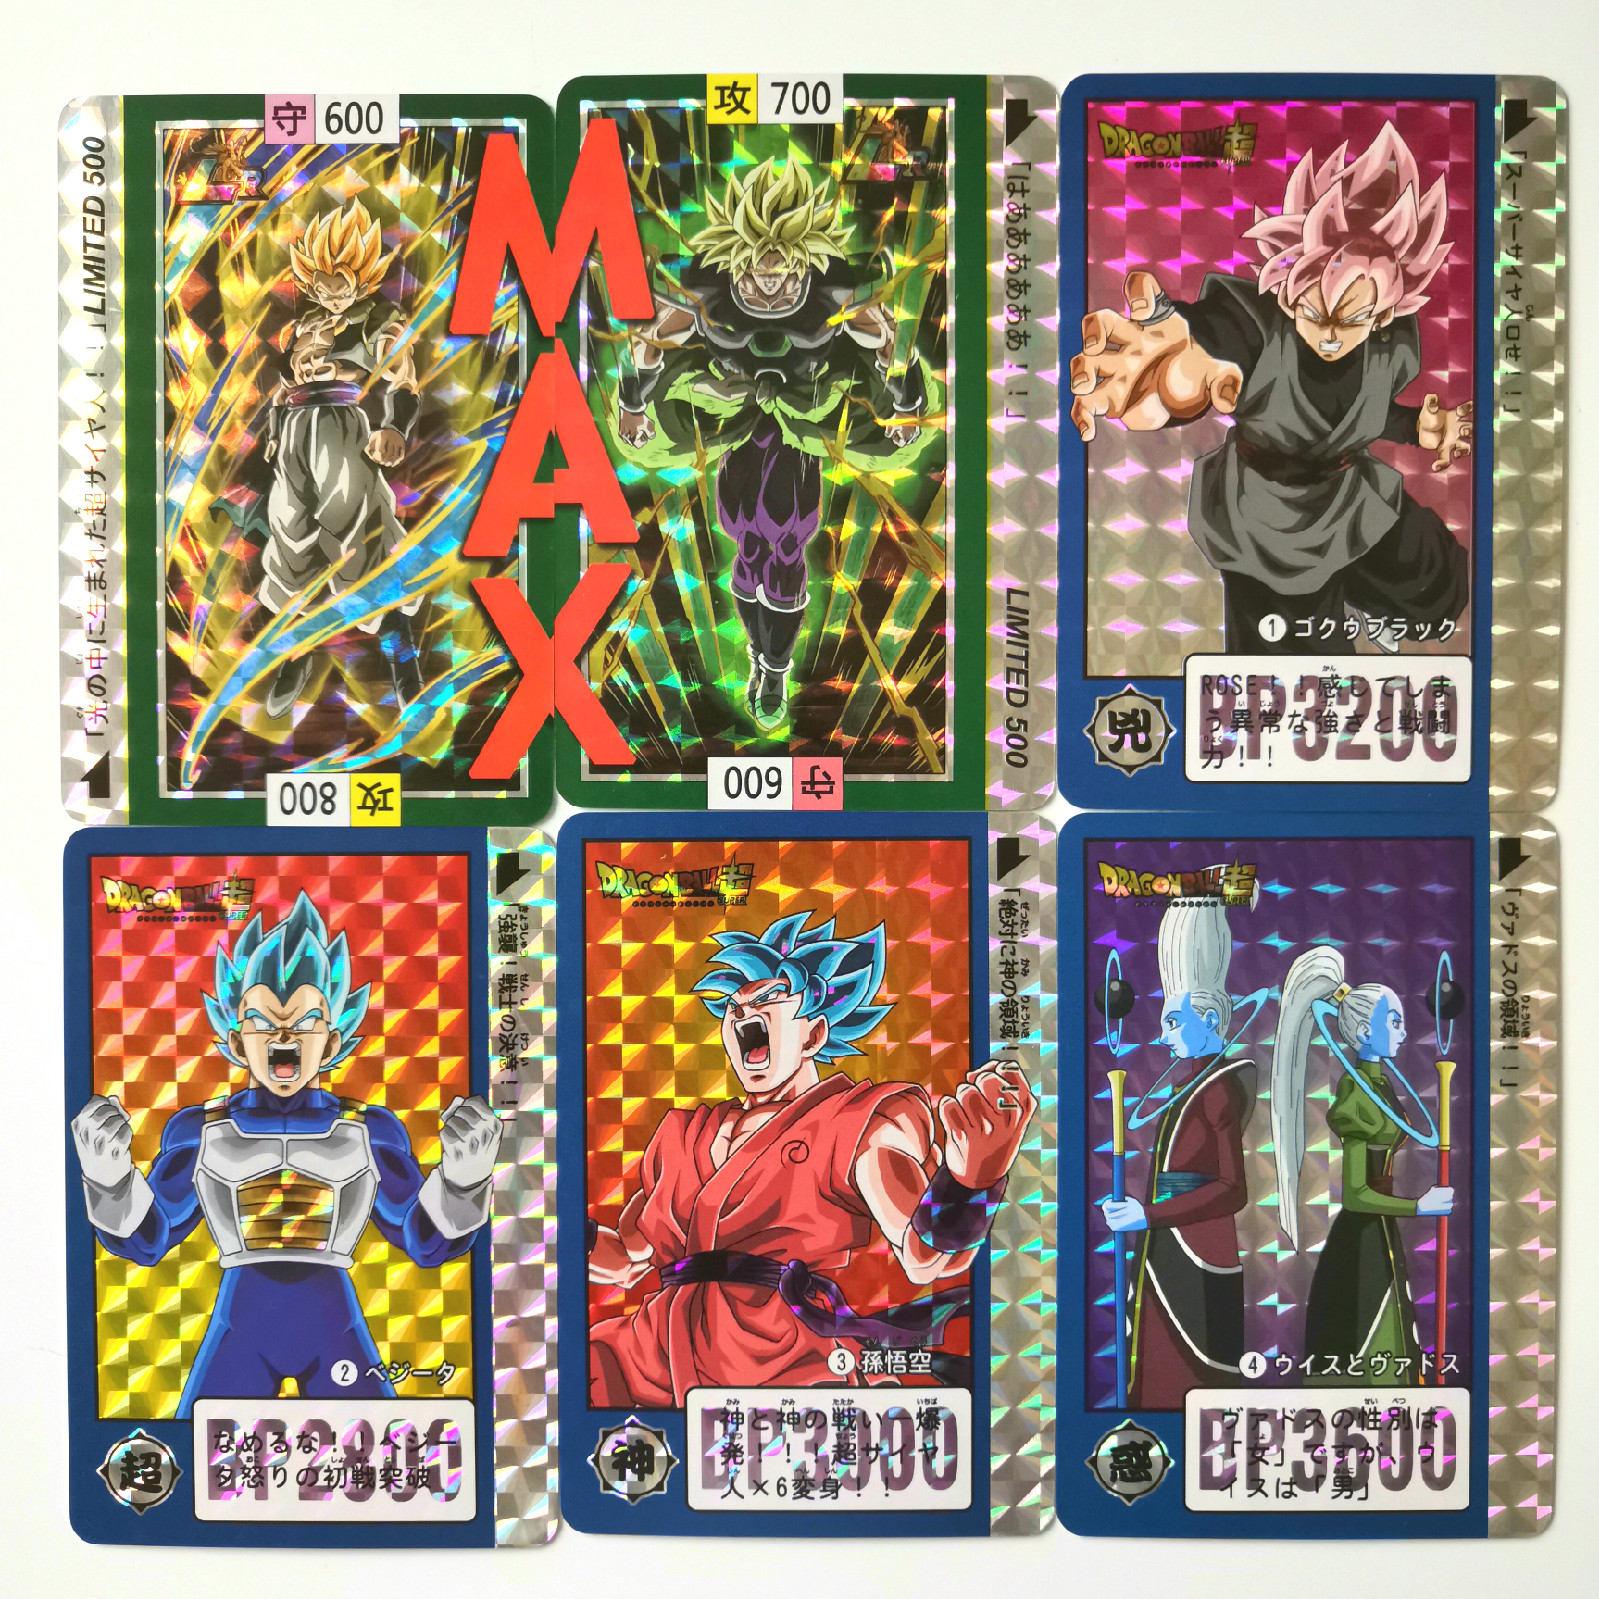 45pcs/set Super Dragon Ball Z Tenth Bomb Heroes Battle Card Ultra Instinct Goku Vegeta Super Game Collection Cards